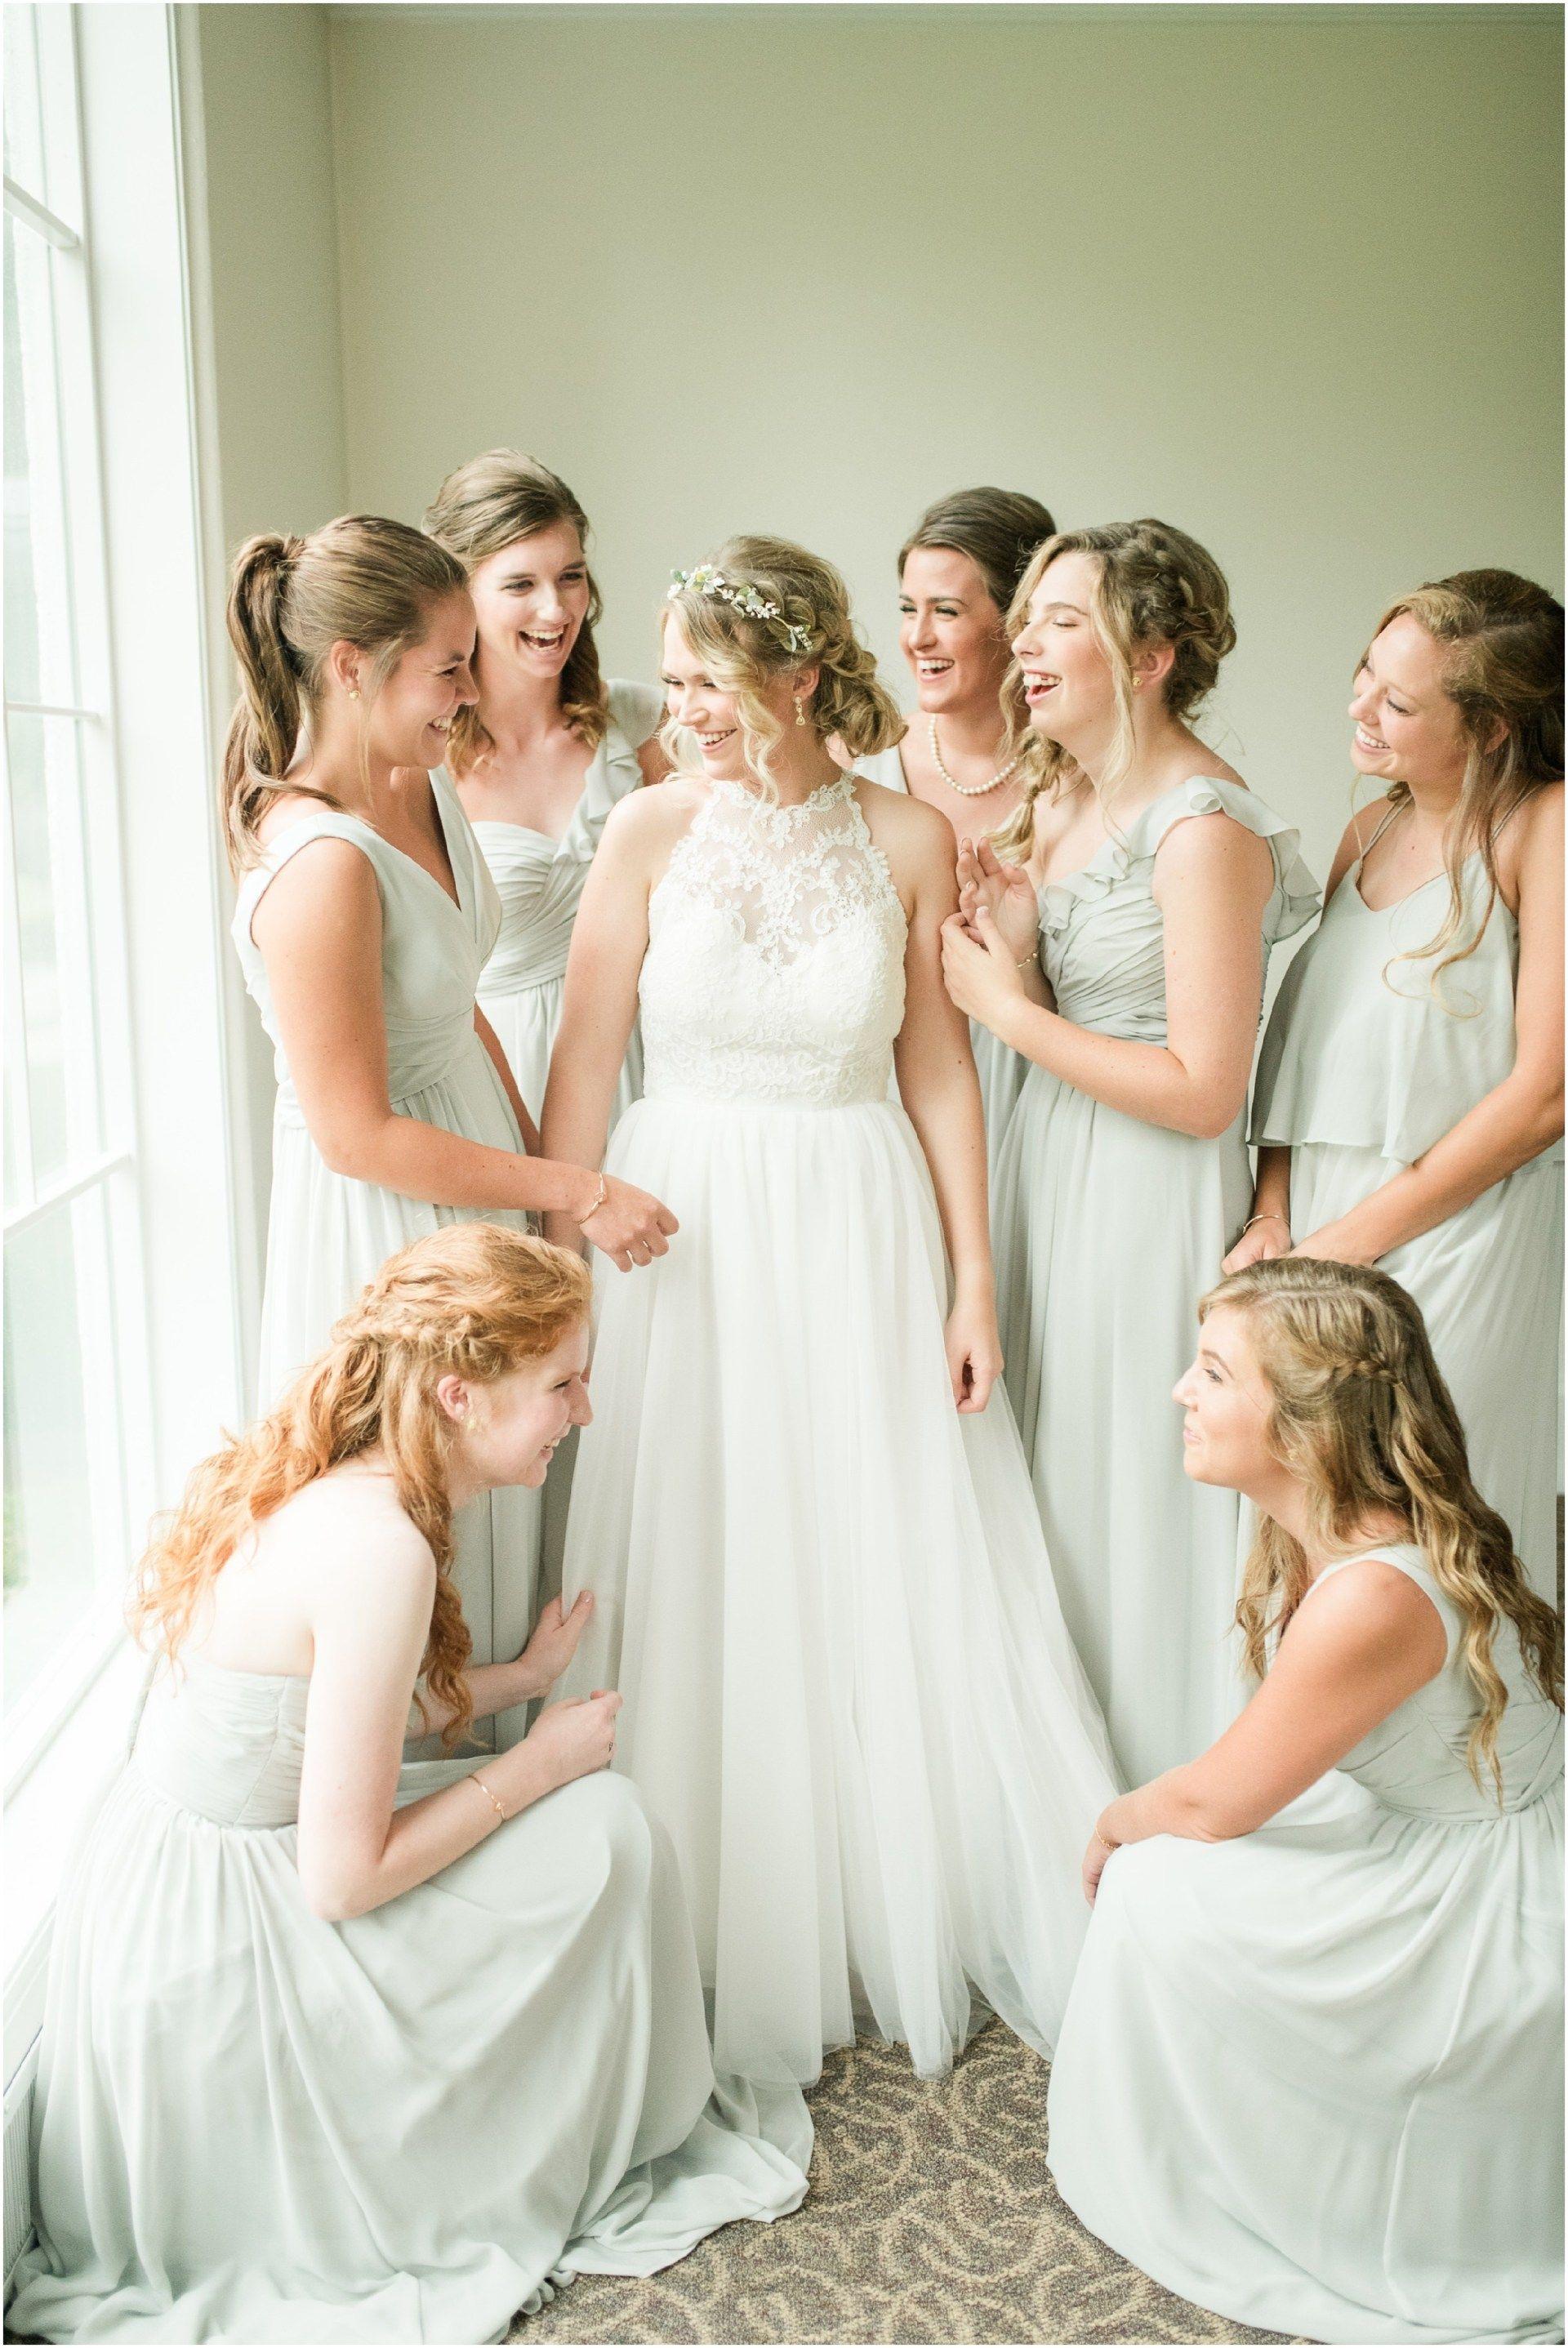 Pin On Greenery Wedding Inspiration